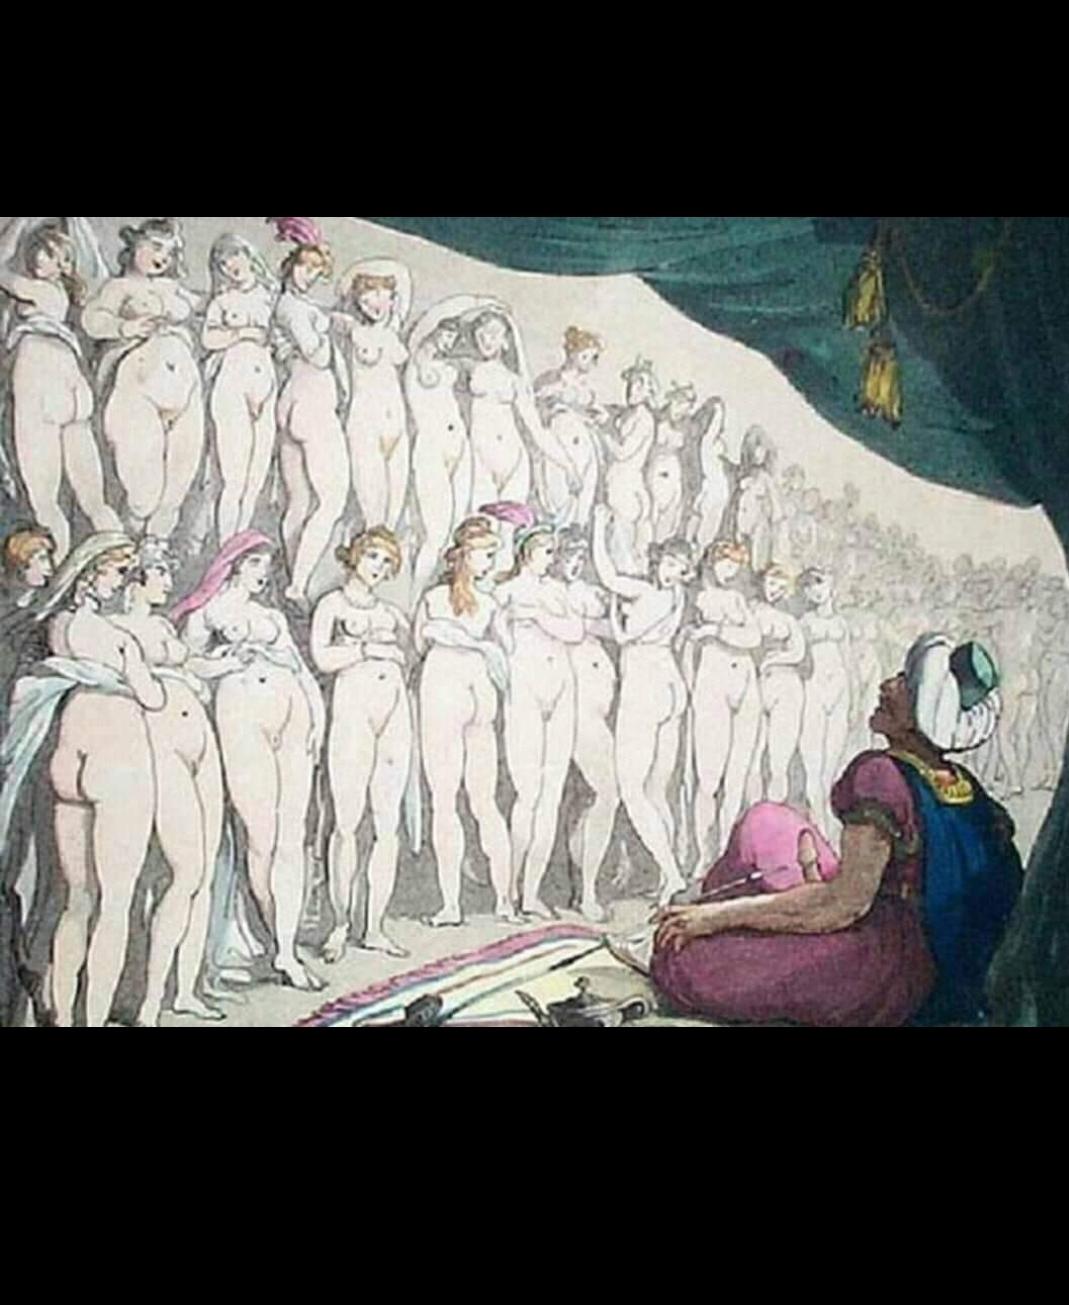 art 72 virgins afterlife sex group gang bang imaginary heaven idiot Islamist Jannah